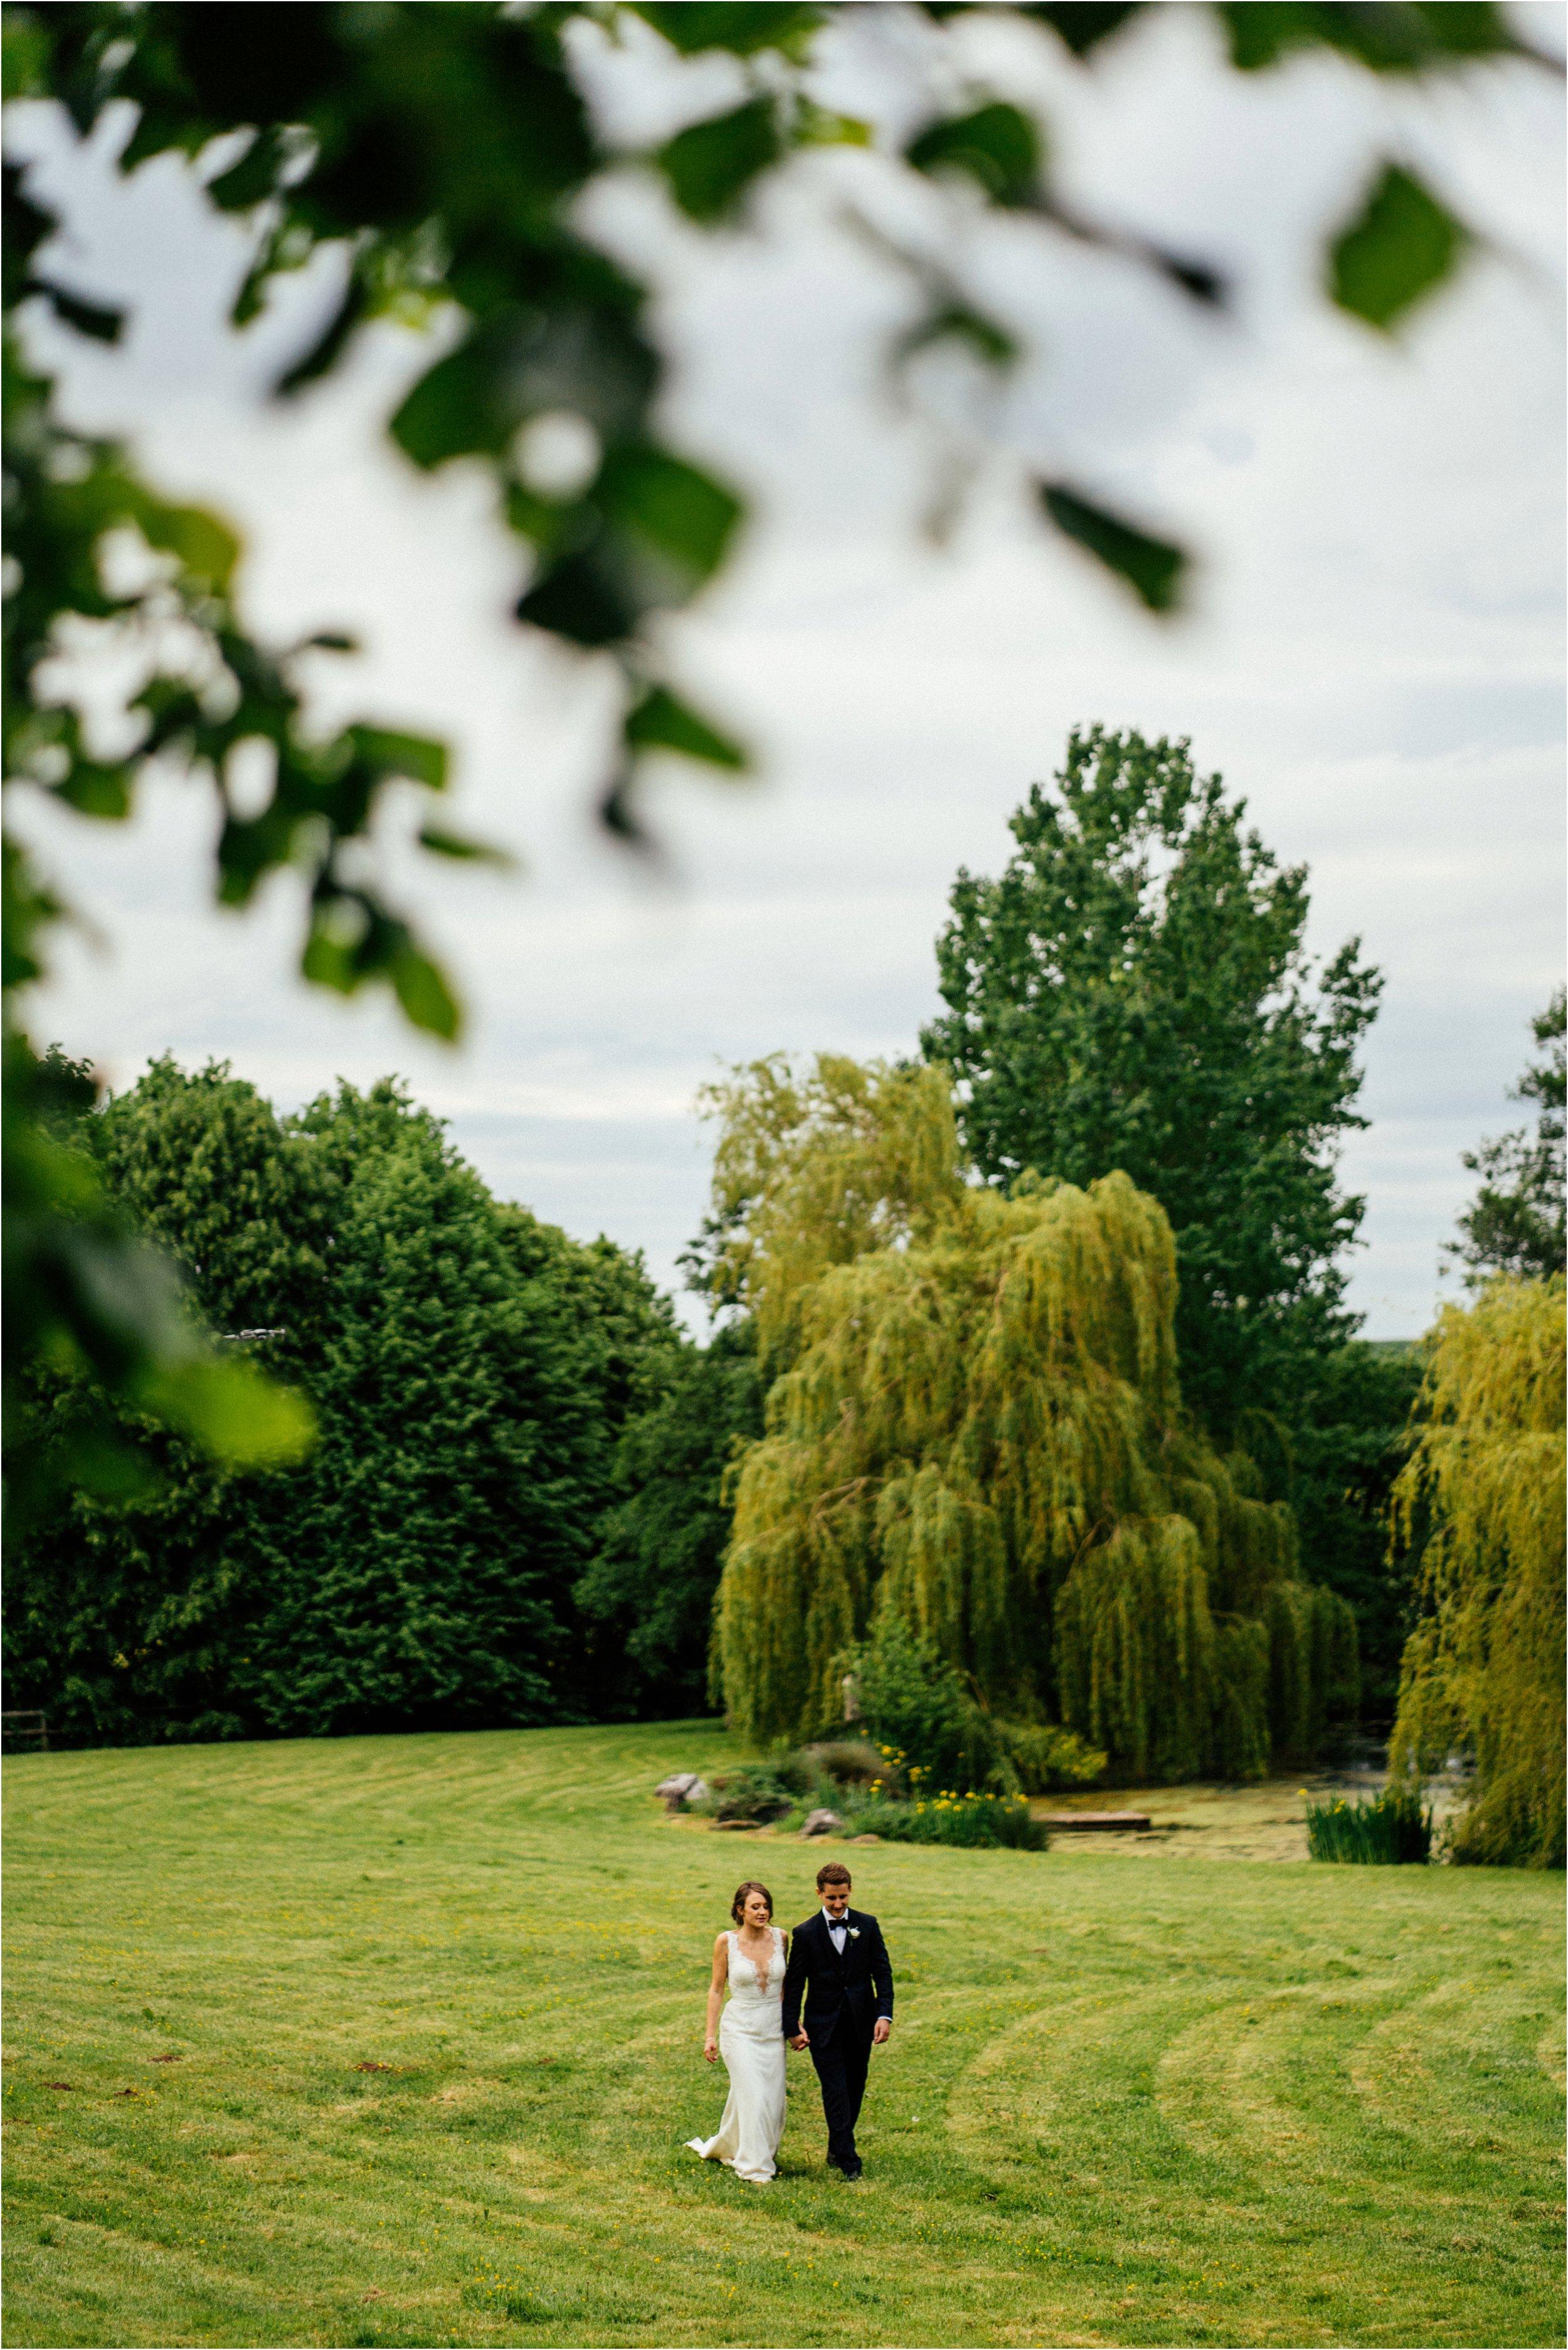 Dewsall Court Herefordshire wedding photographer_0136.jpg